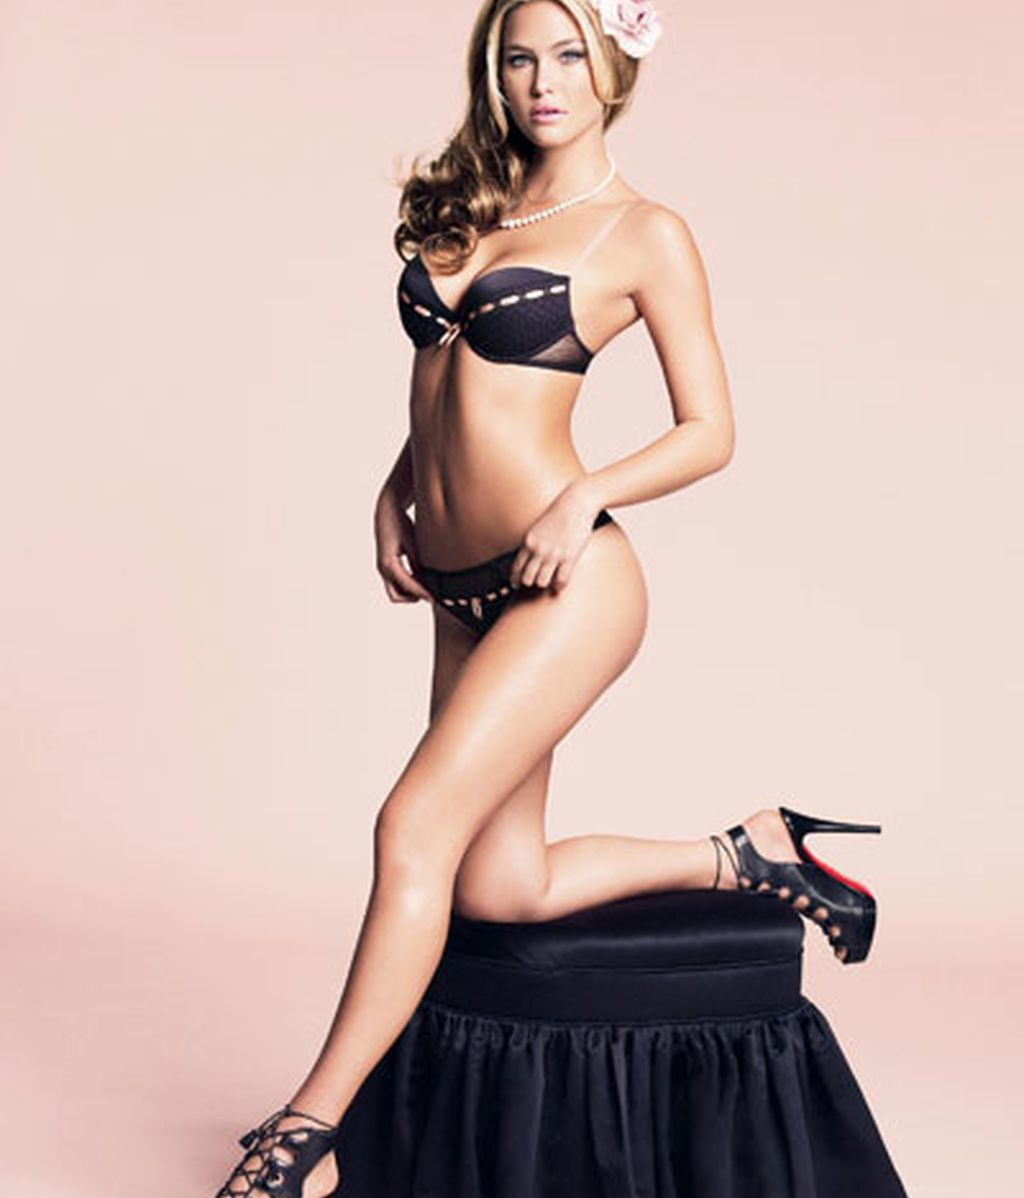 La novia de DiCaprio se prueba sujetadores